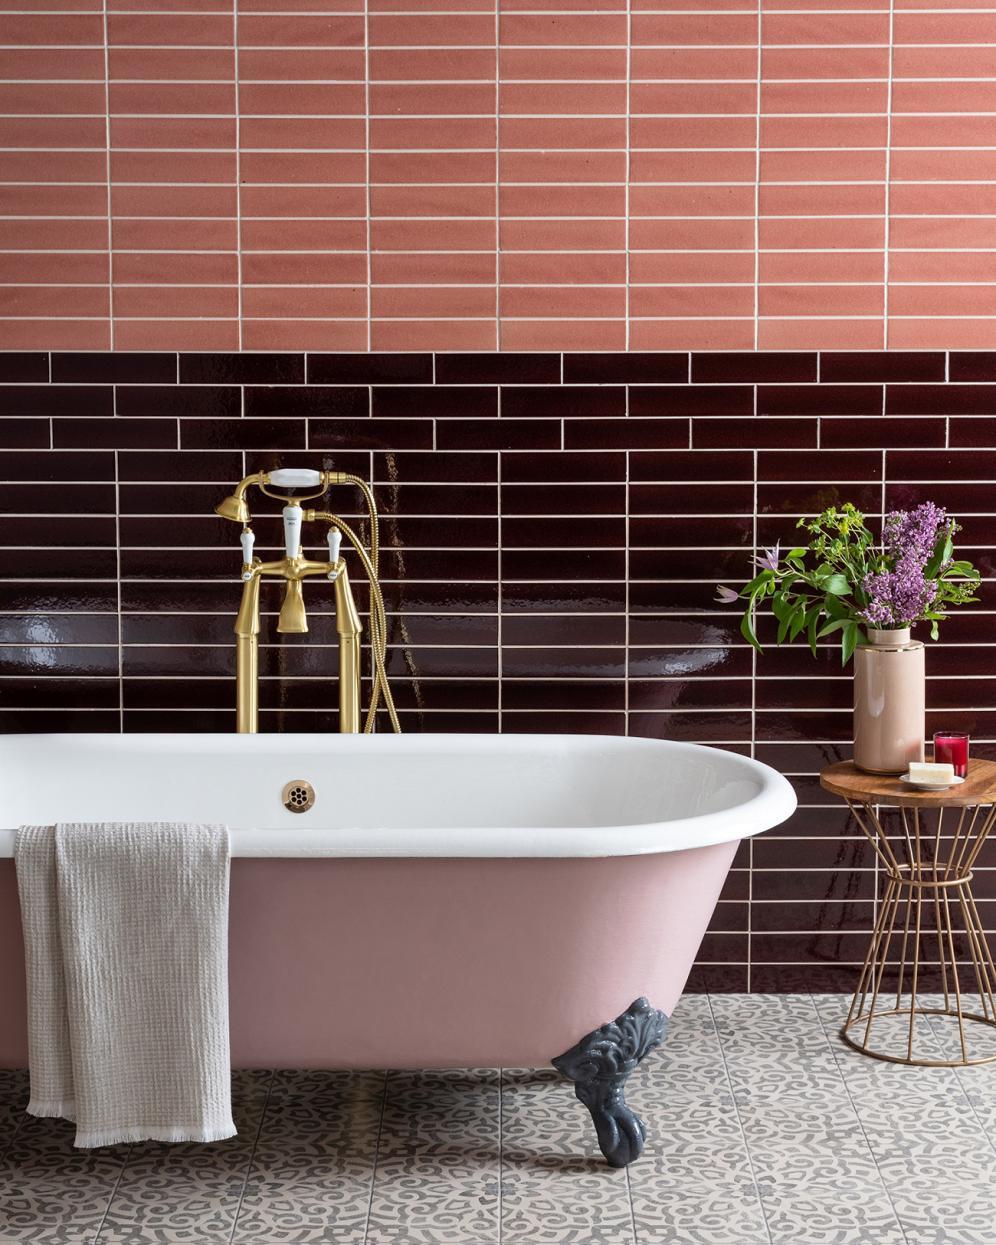 carrelage original salle de bain rose